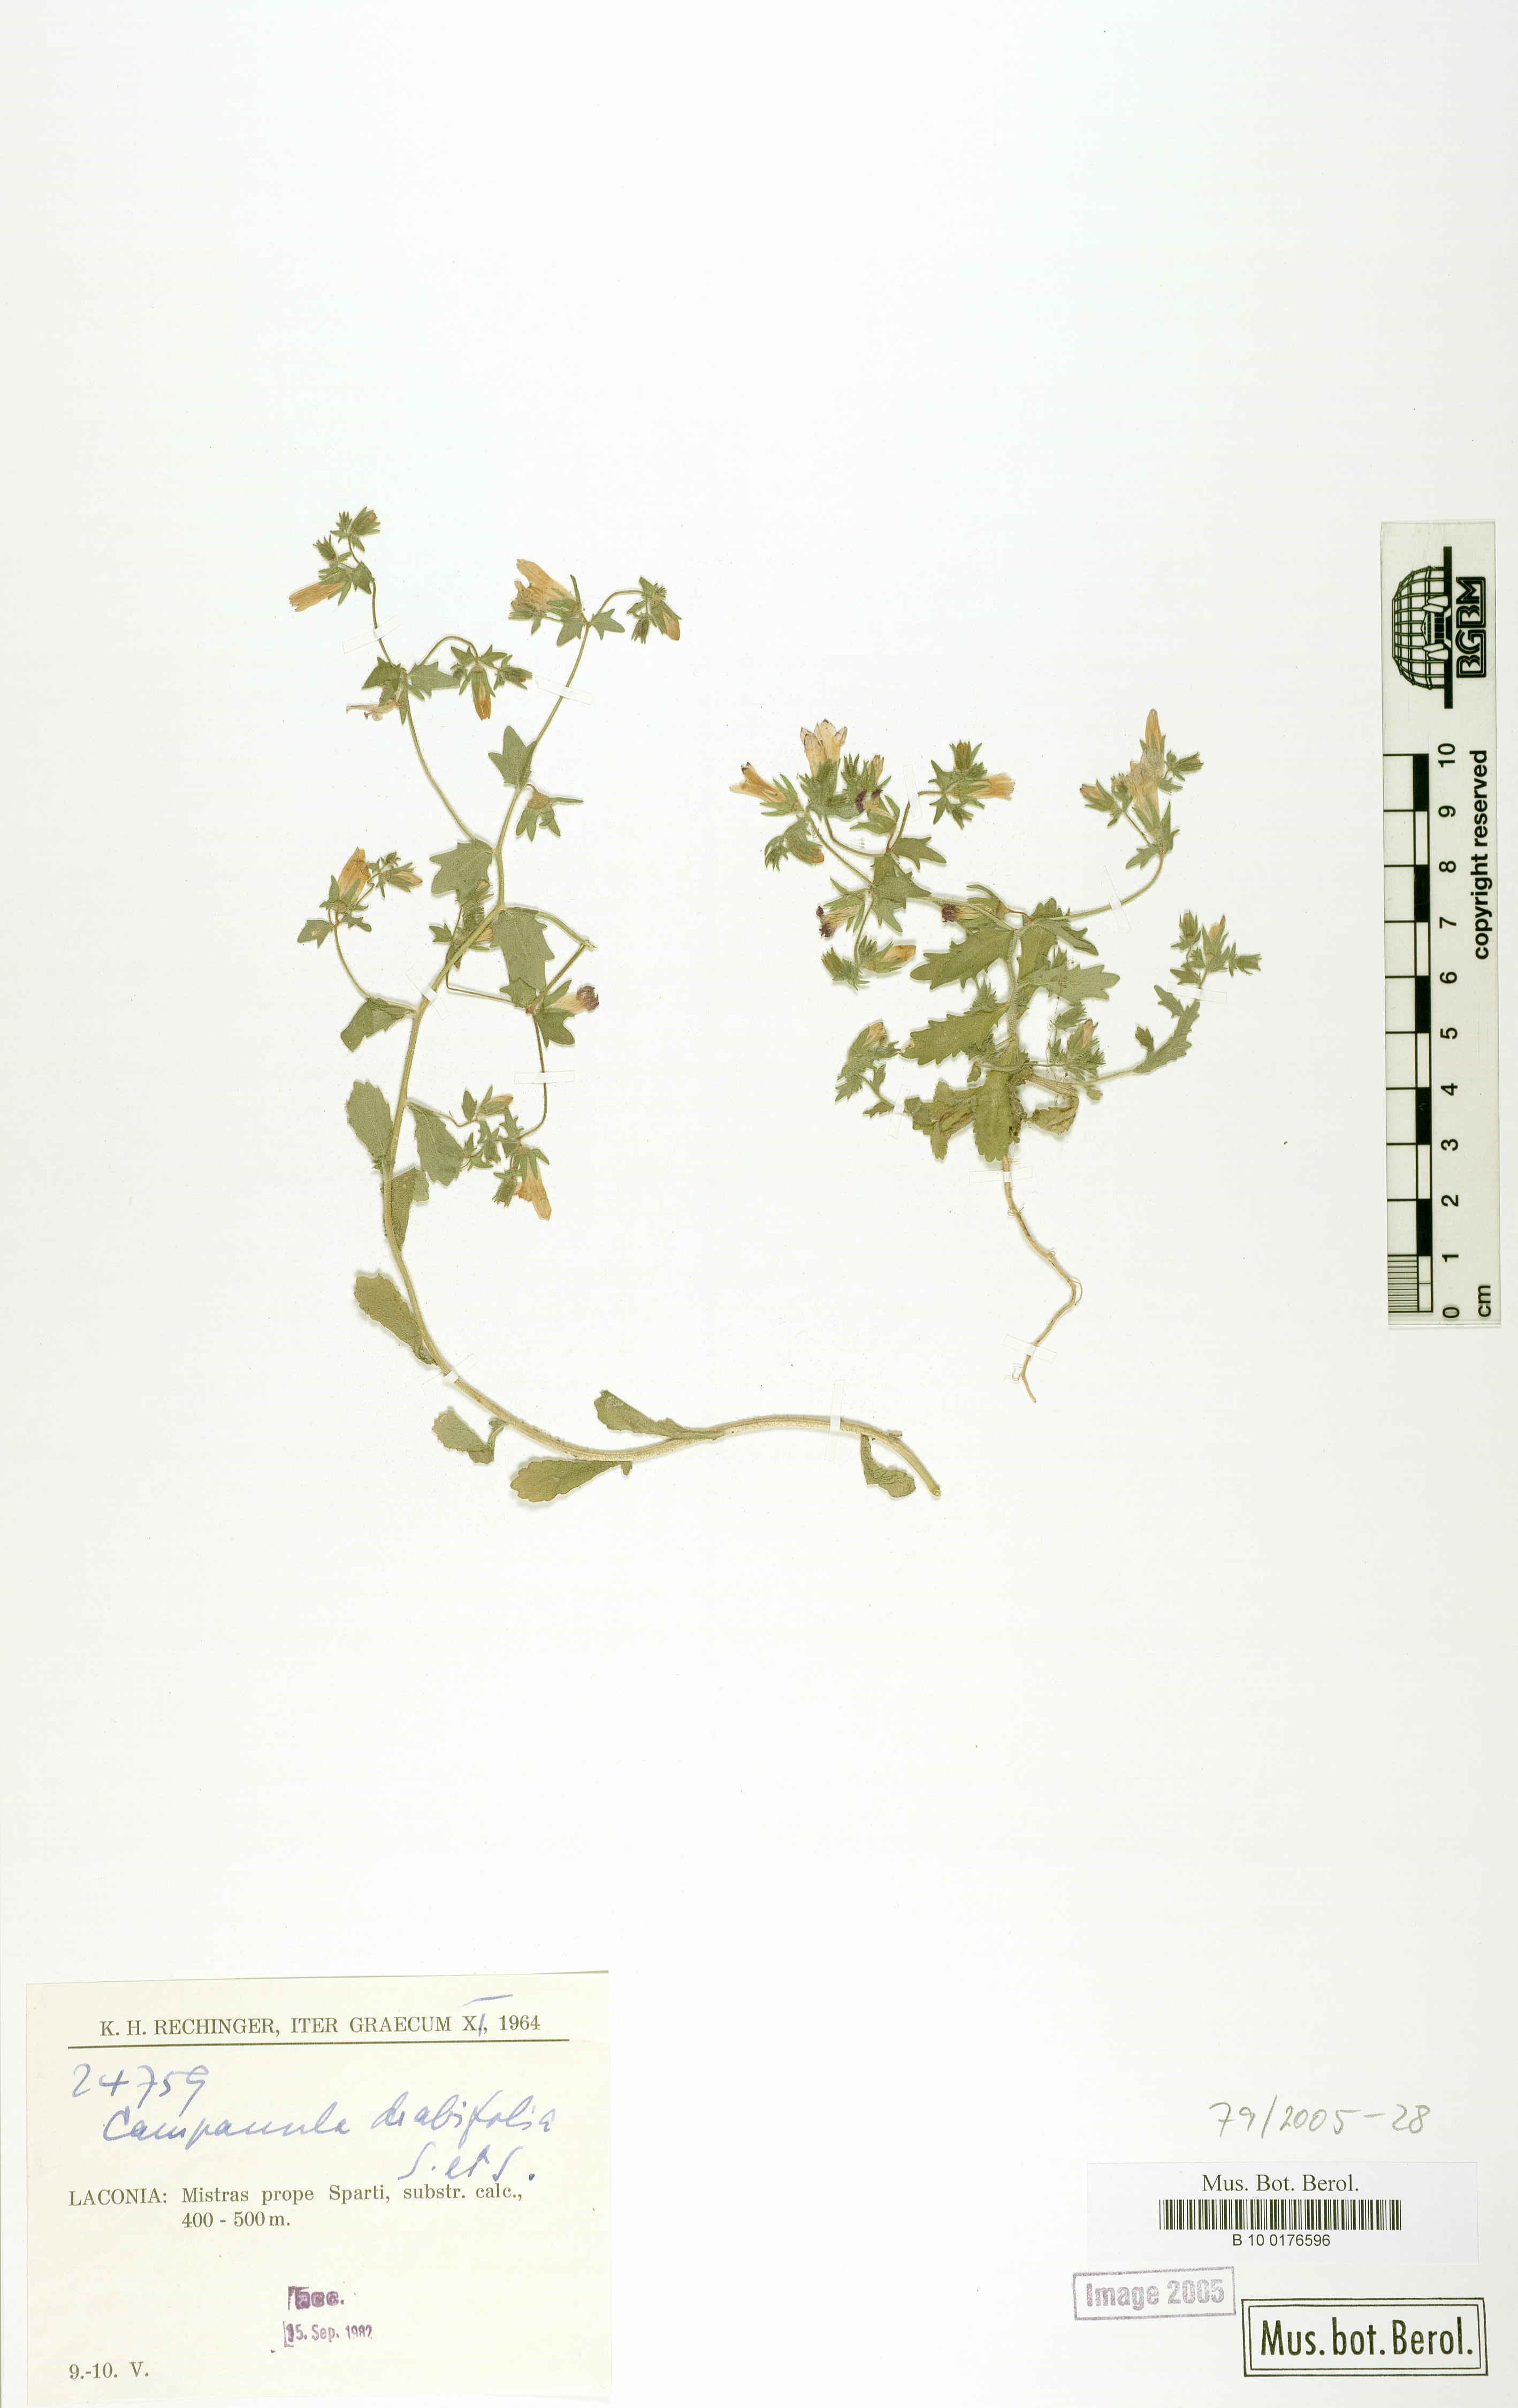 http://ww2.bgbm.org/herbarium/images/B/10/01/76/59/B_10_0176596.jpg